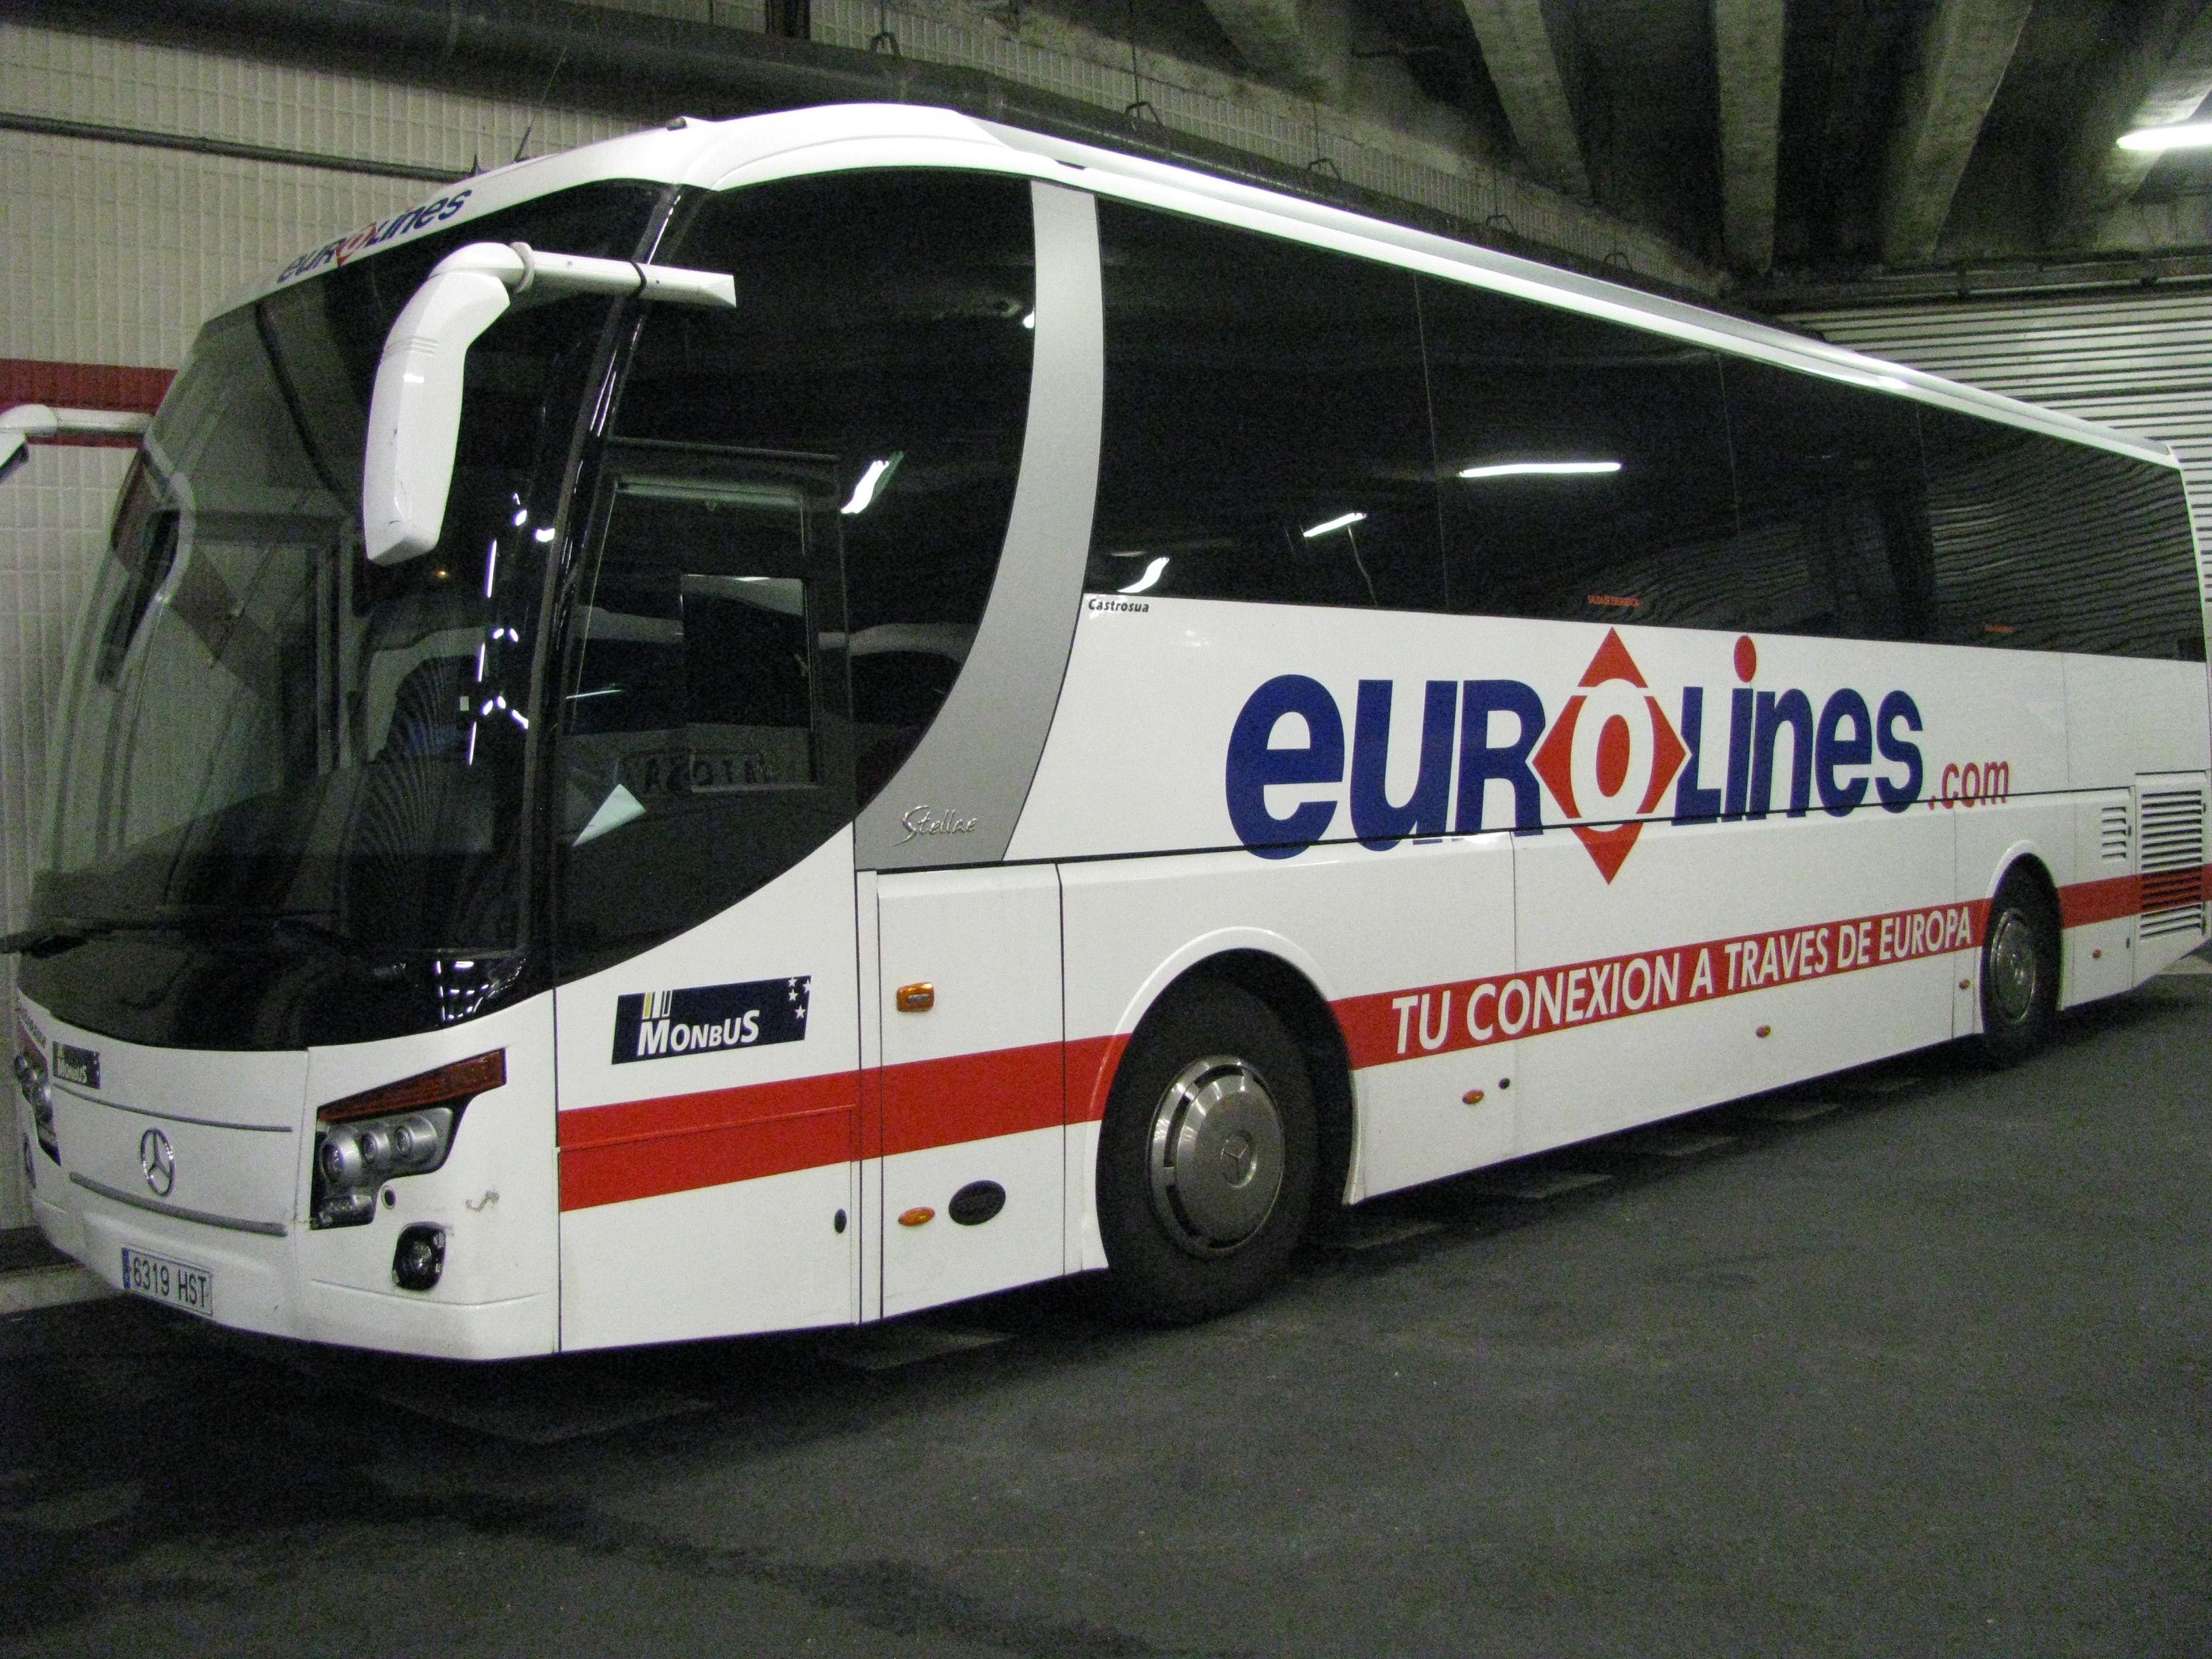 Eurolines Bus At Paris Station